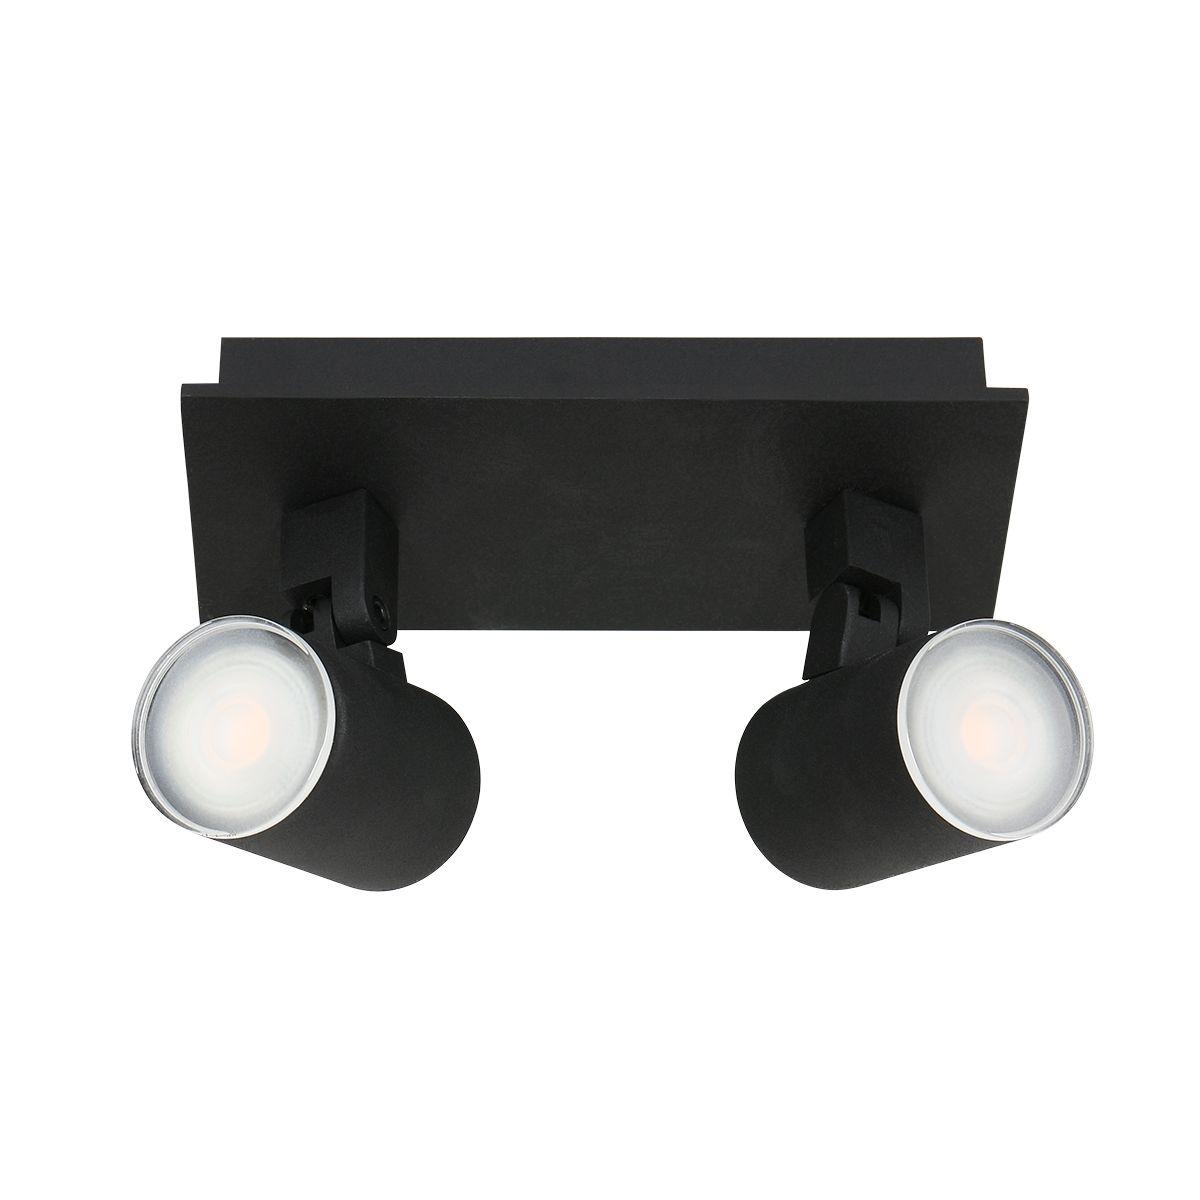 Steinhauer - Points noirs - badkamer spot 2L - zwart